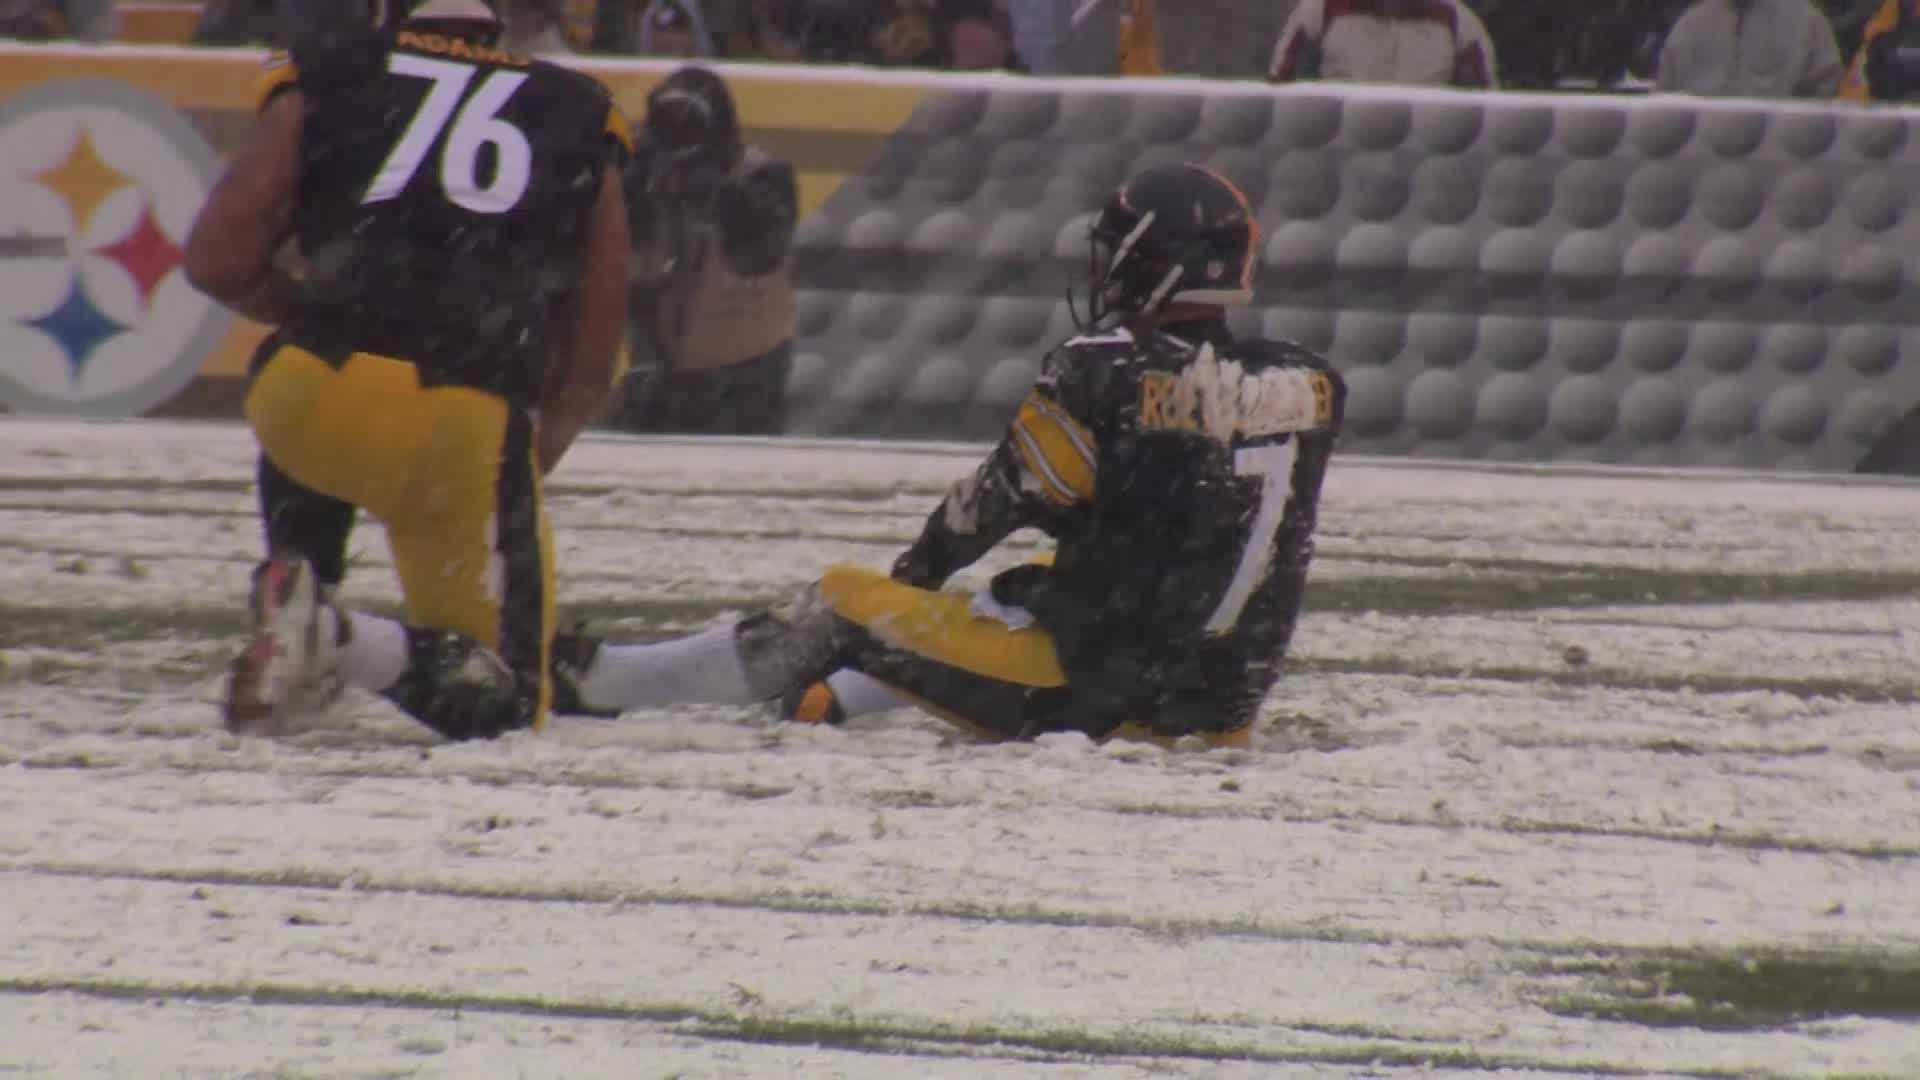 Ben Roethlisberger sitting on field in snow